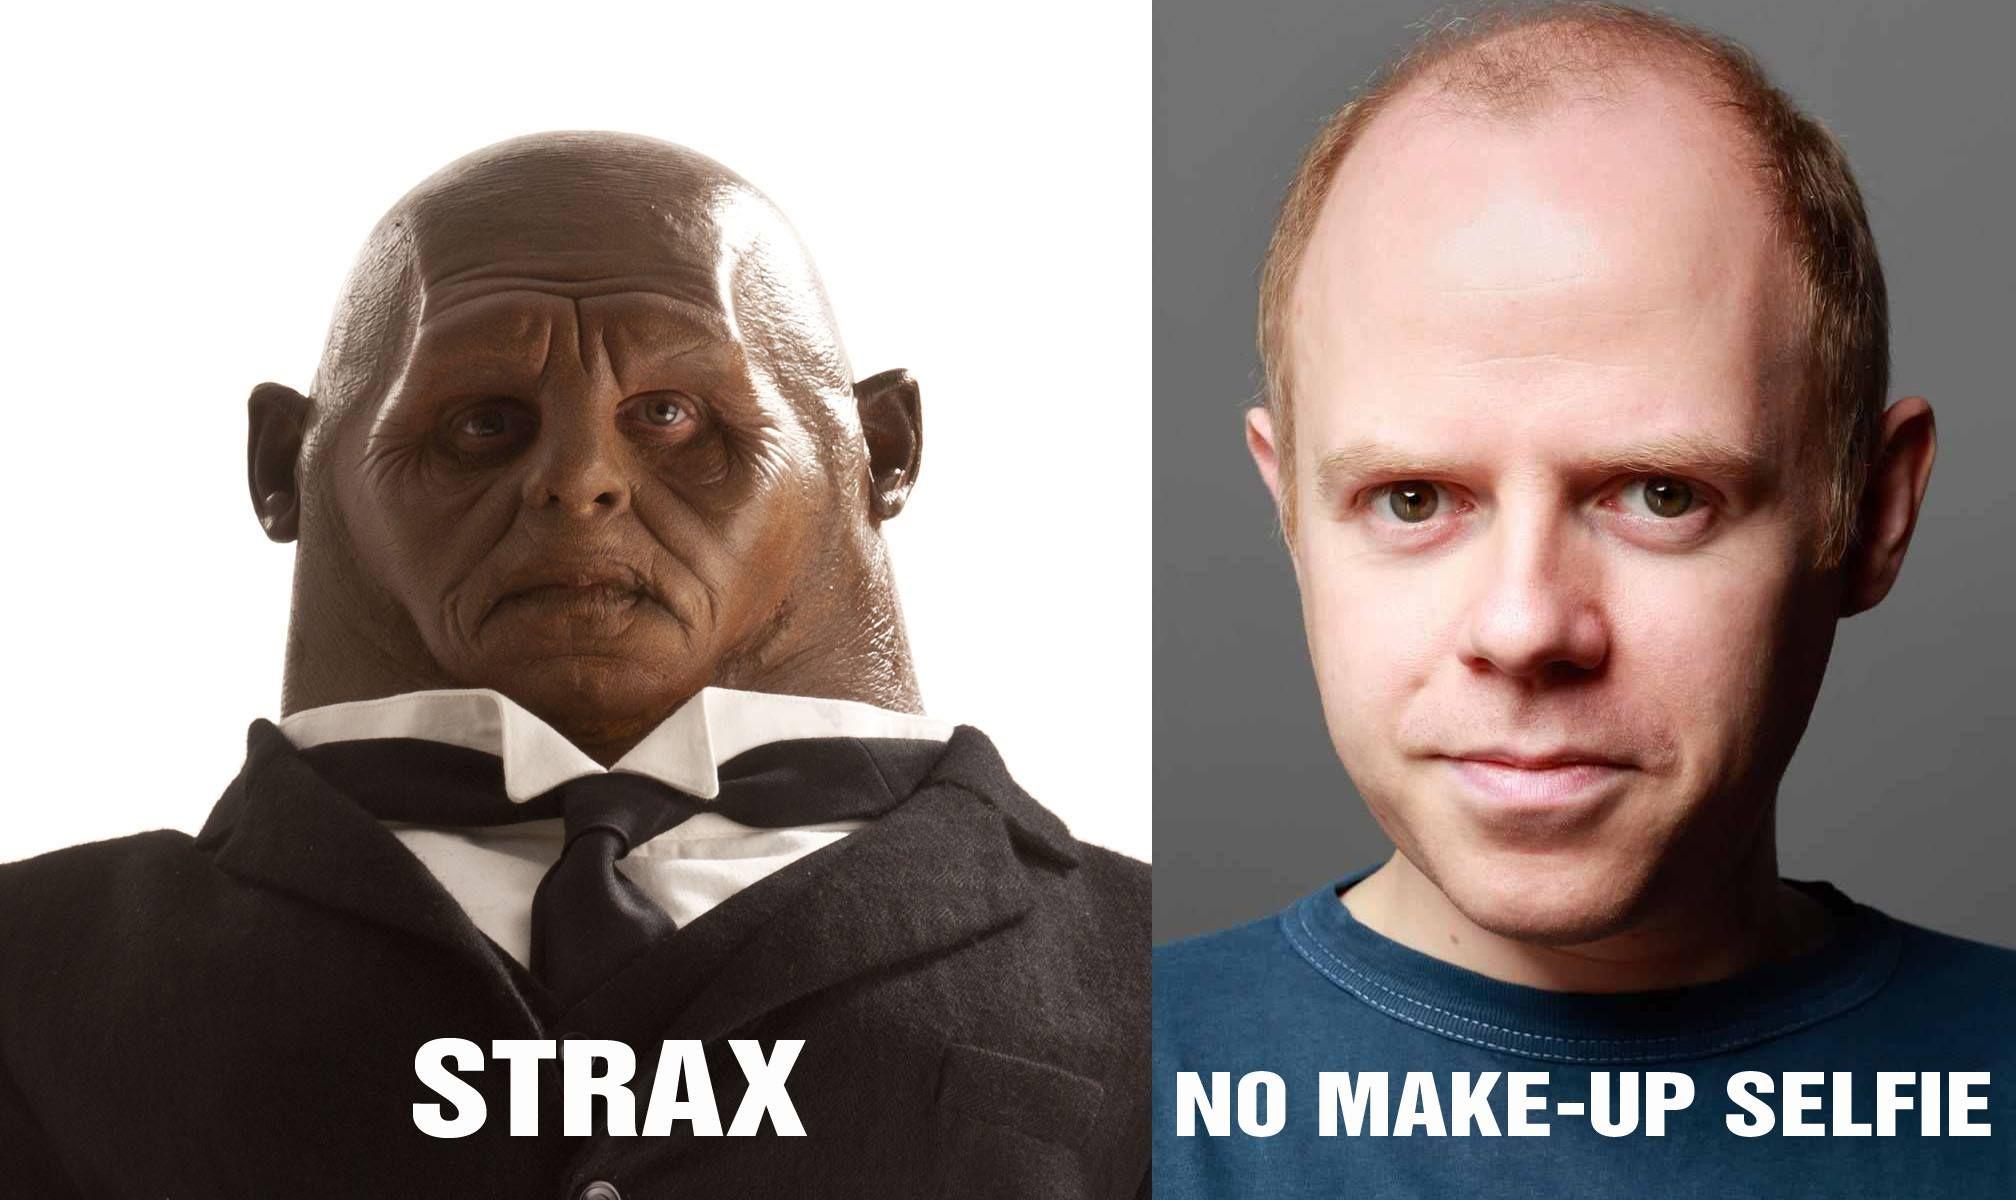 Dan Starkey as Strax! Could imagine wearing all that? #doctorwho #strax #danstarkey